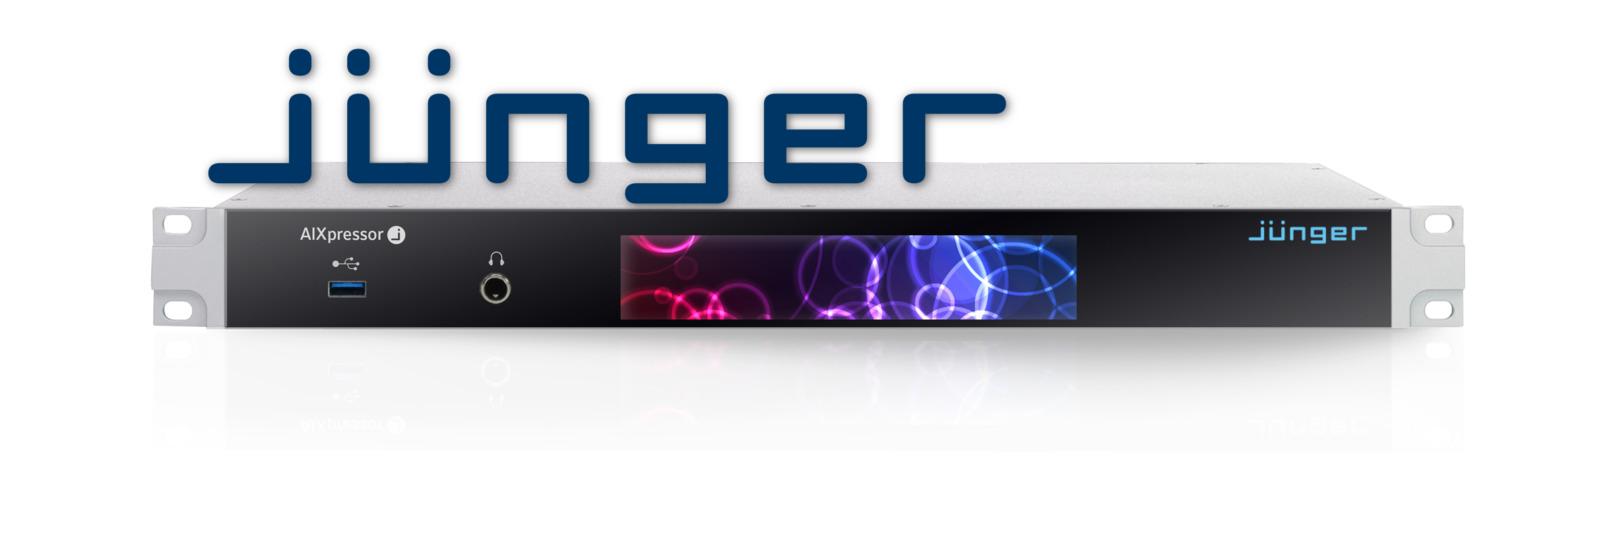 jpg1616_AIXpressor_FrontMirrorMup_FullRes_Logo